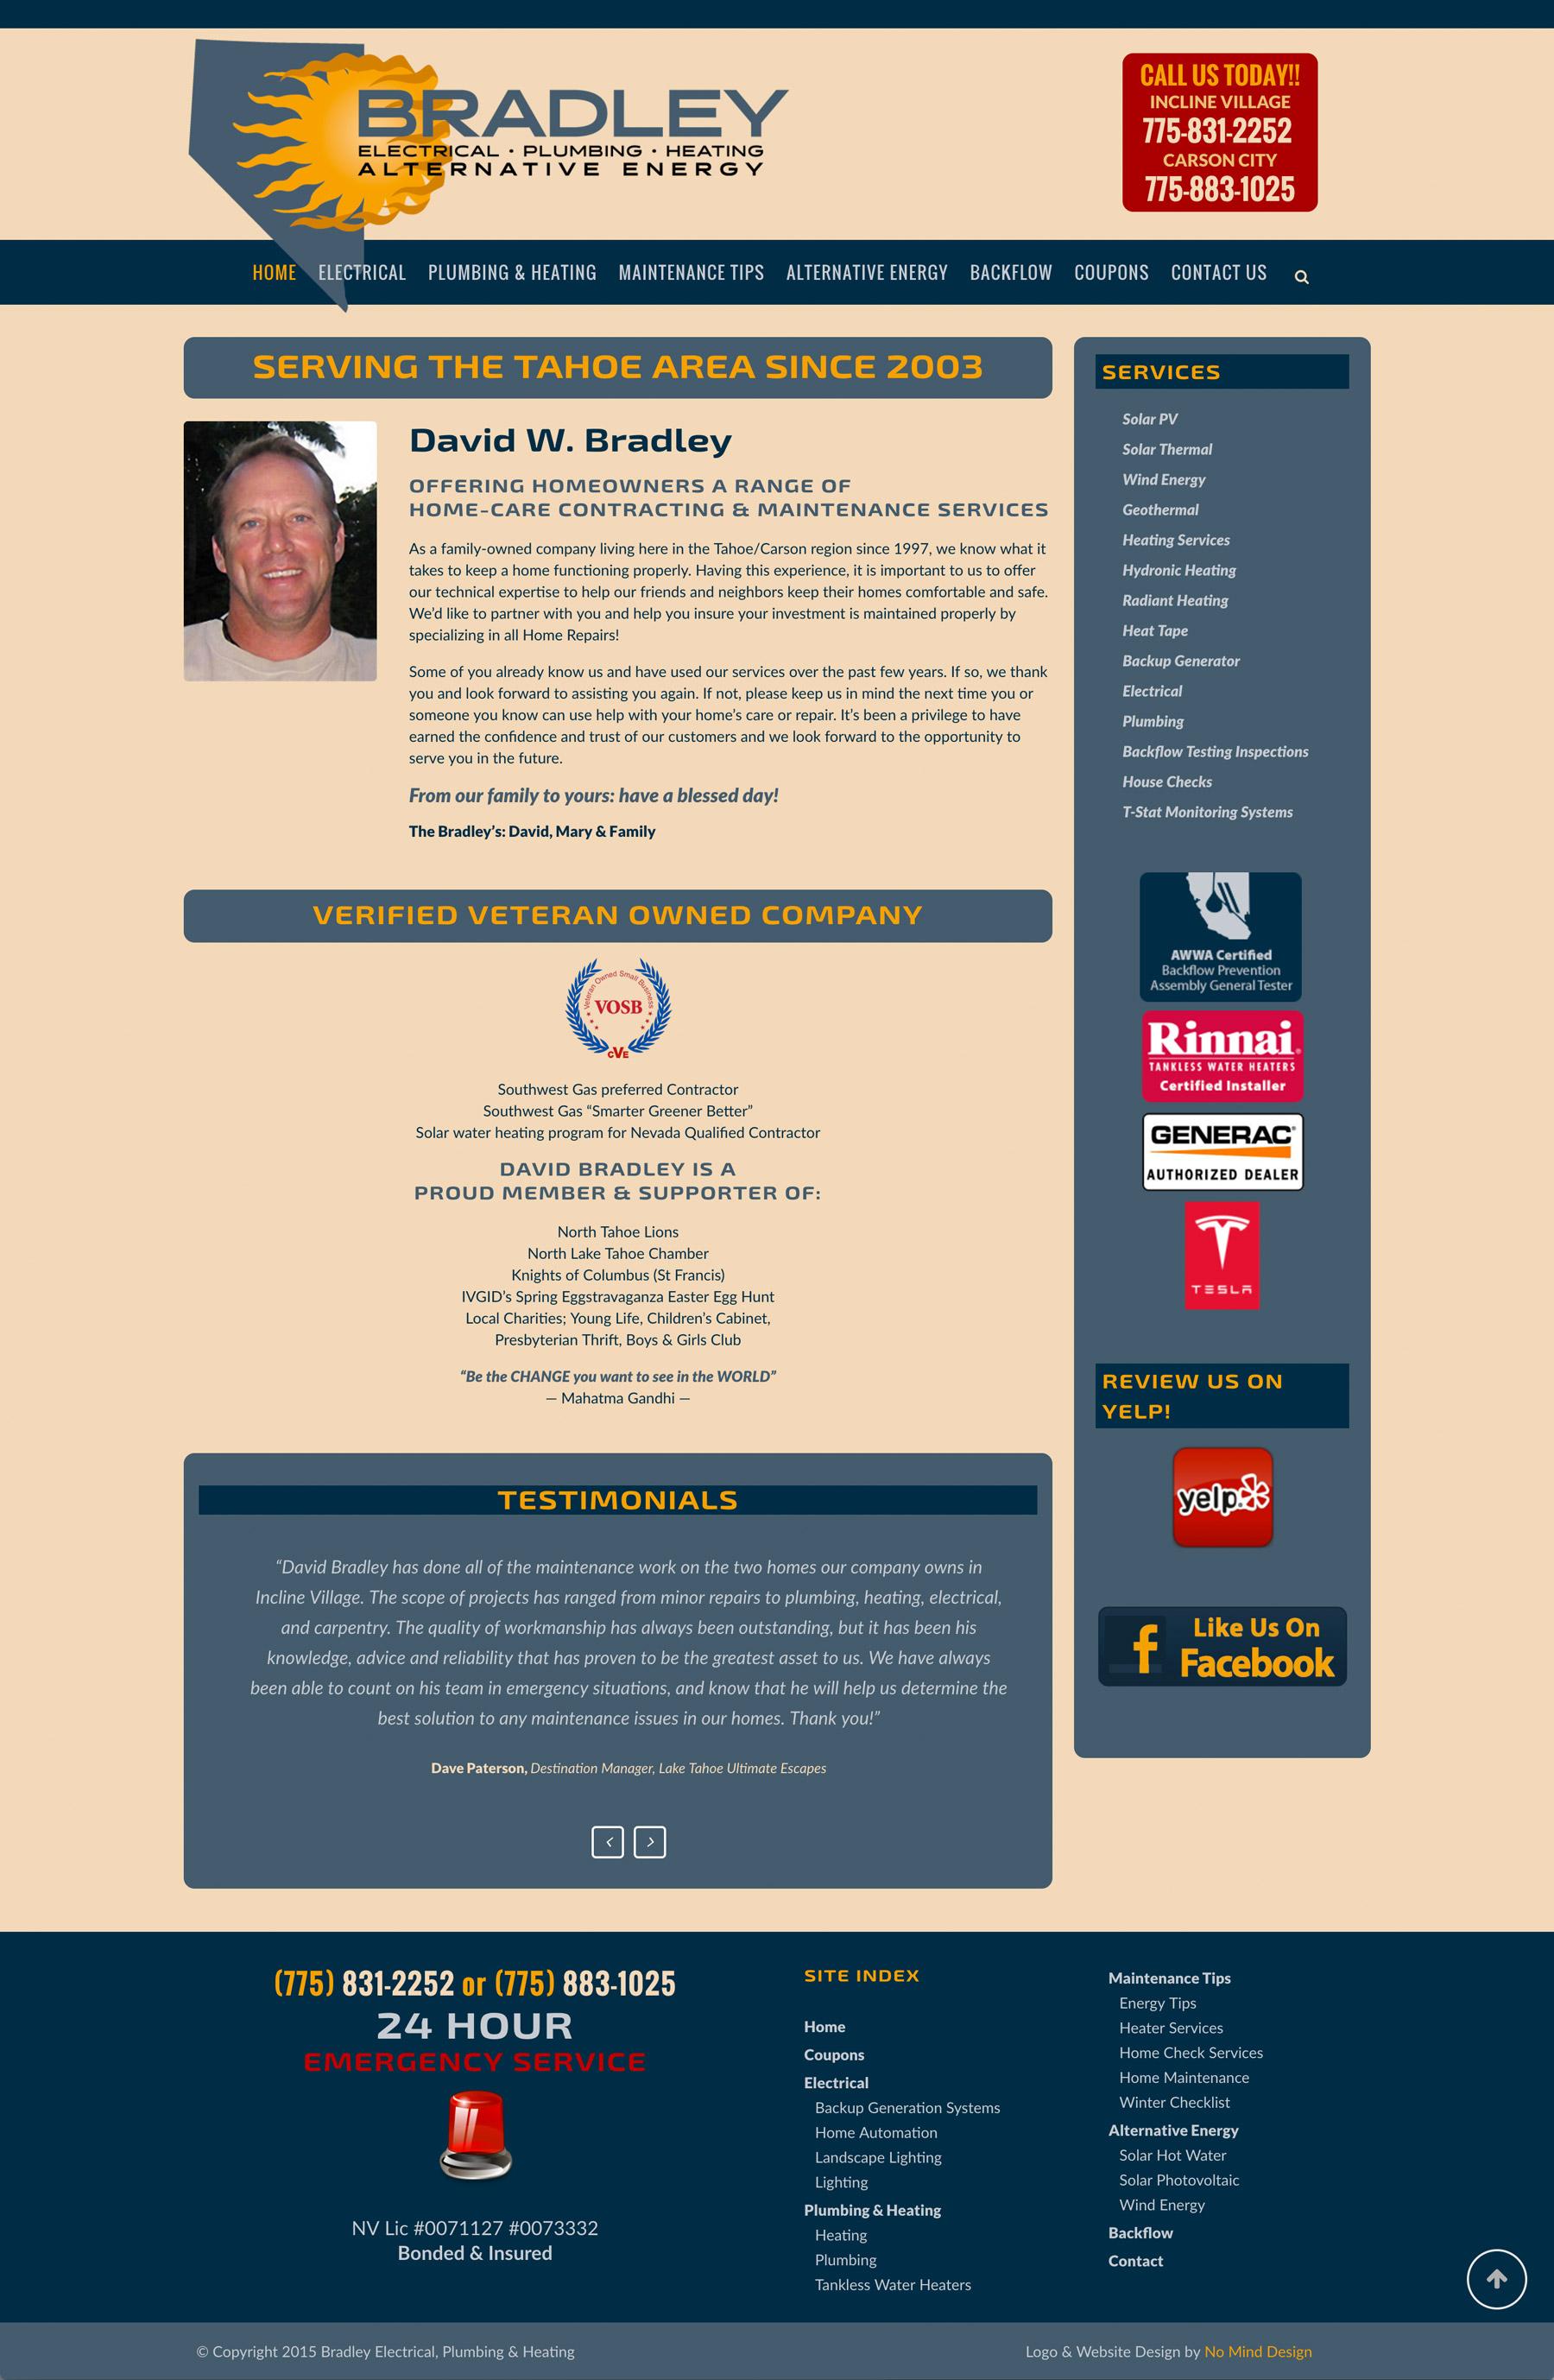 bradley-website-preview